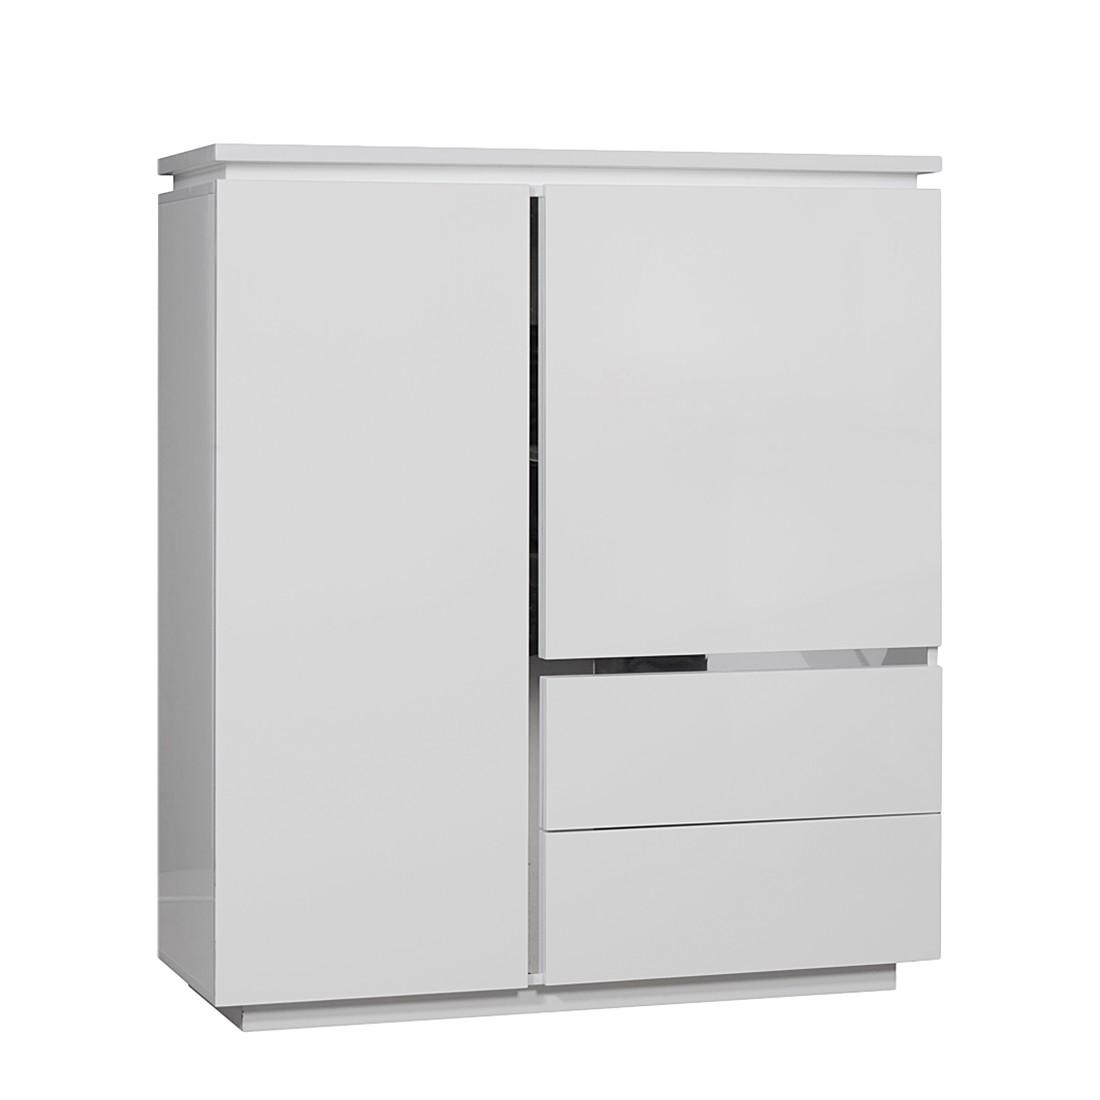 Highboard Oceano - Weiß lackiert - Mit Beleuchtung - Schrank.info ...